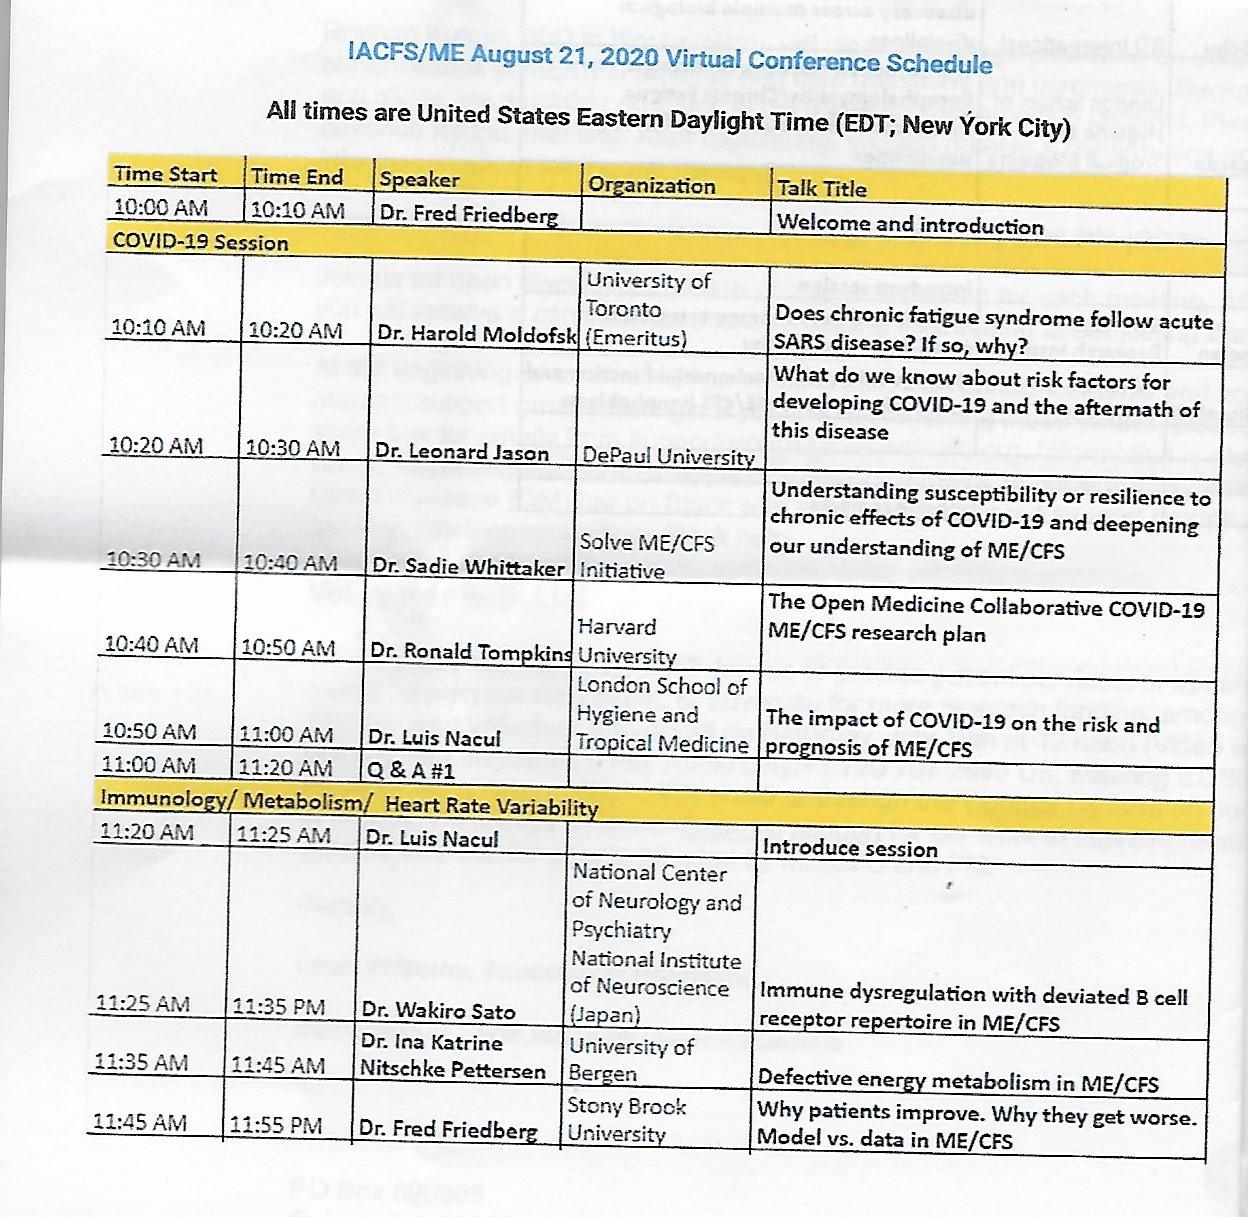 IACFSME Agenda Aug 21 2020  pg 1 of 2 .jpg